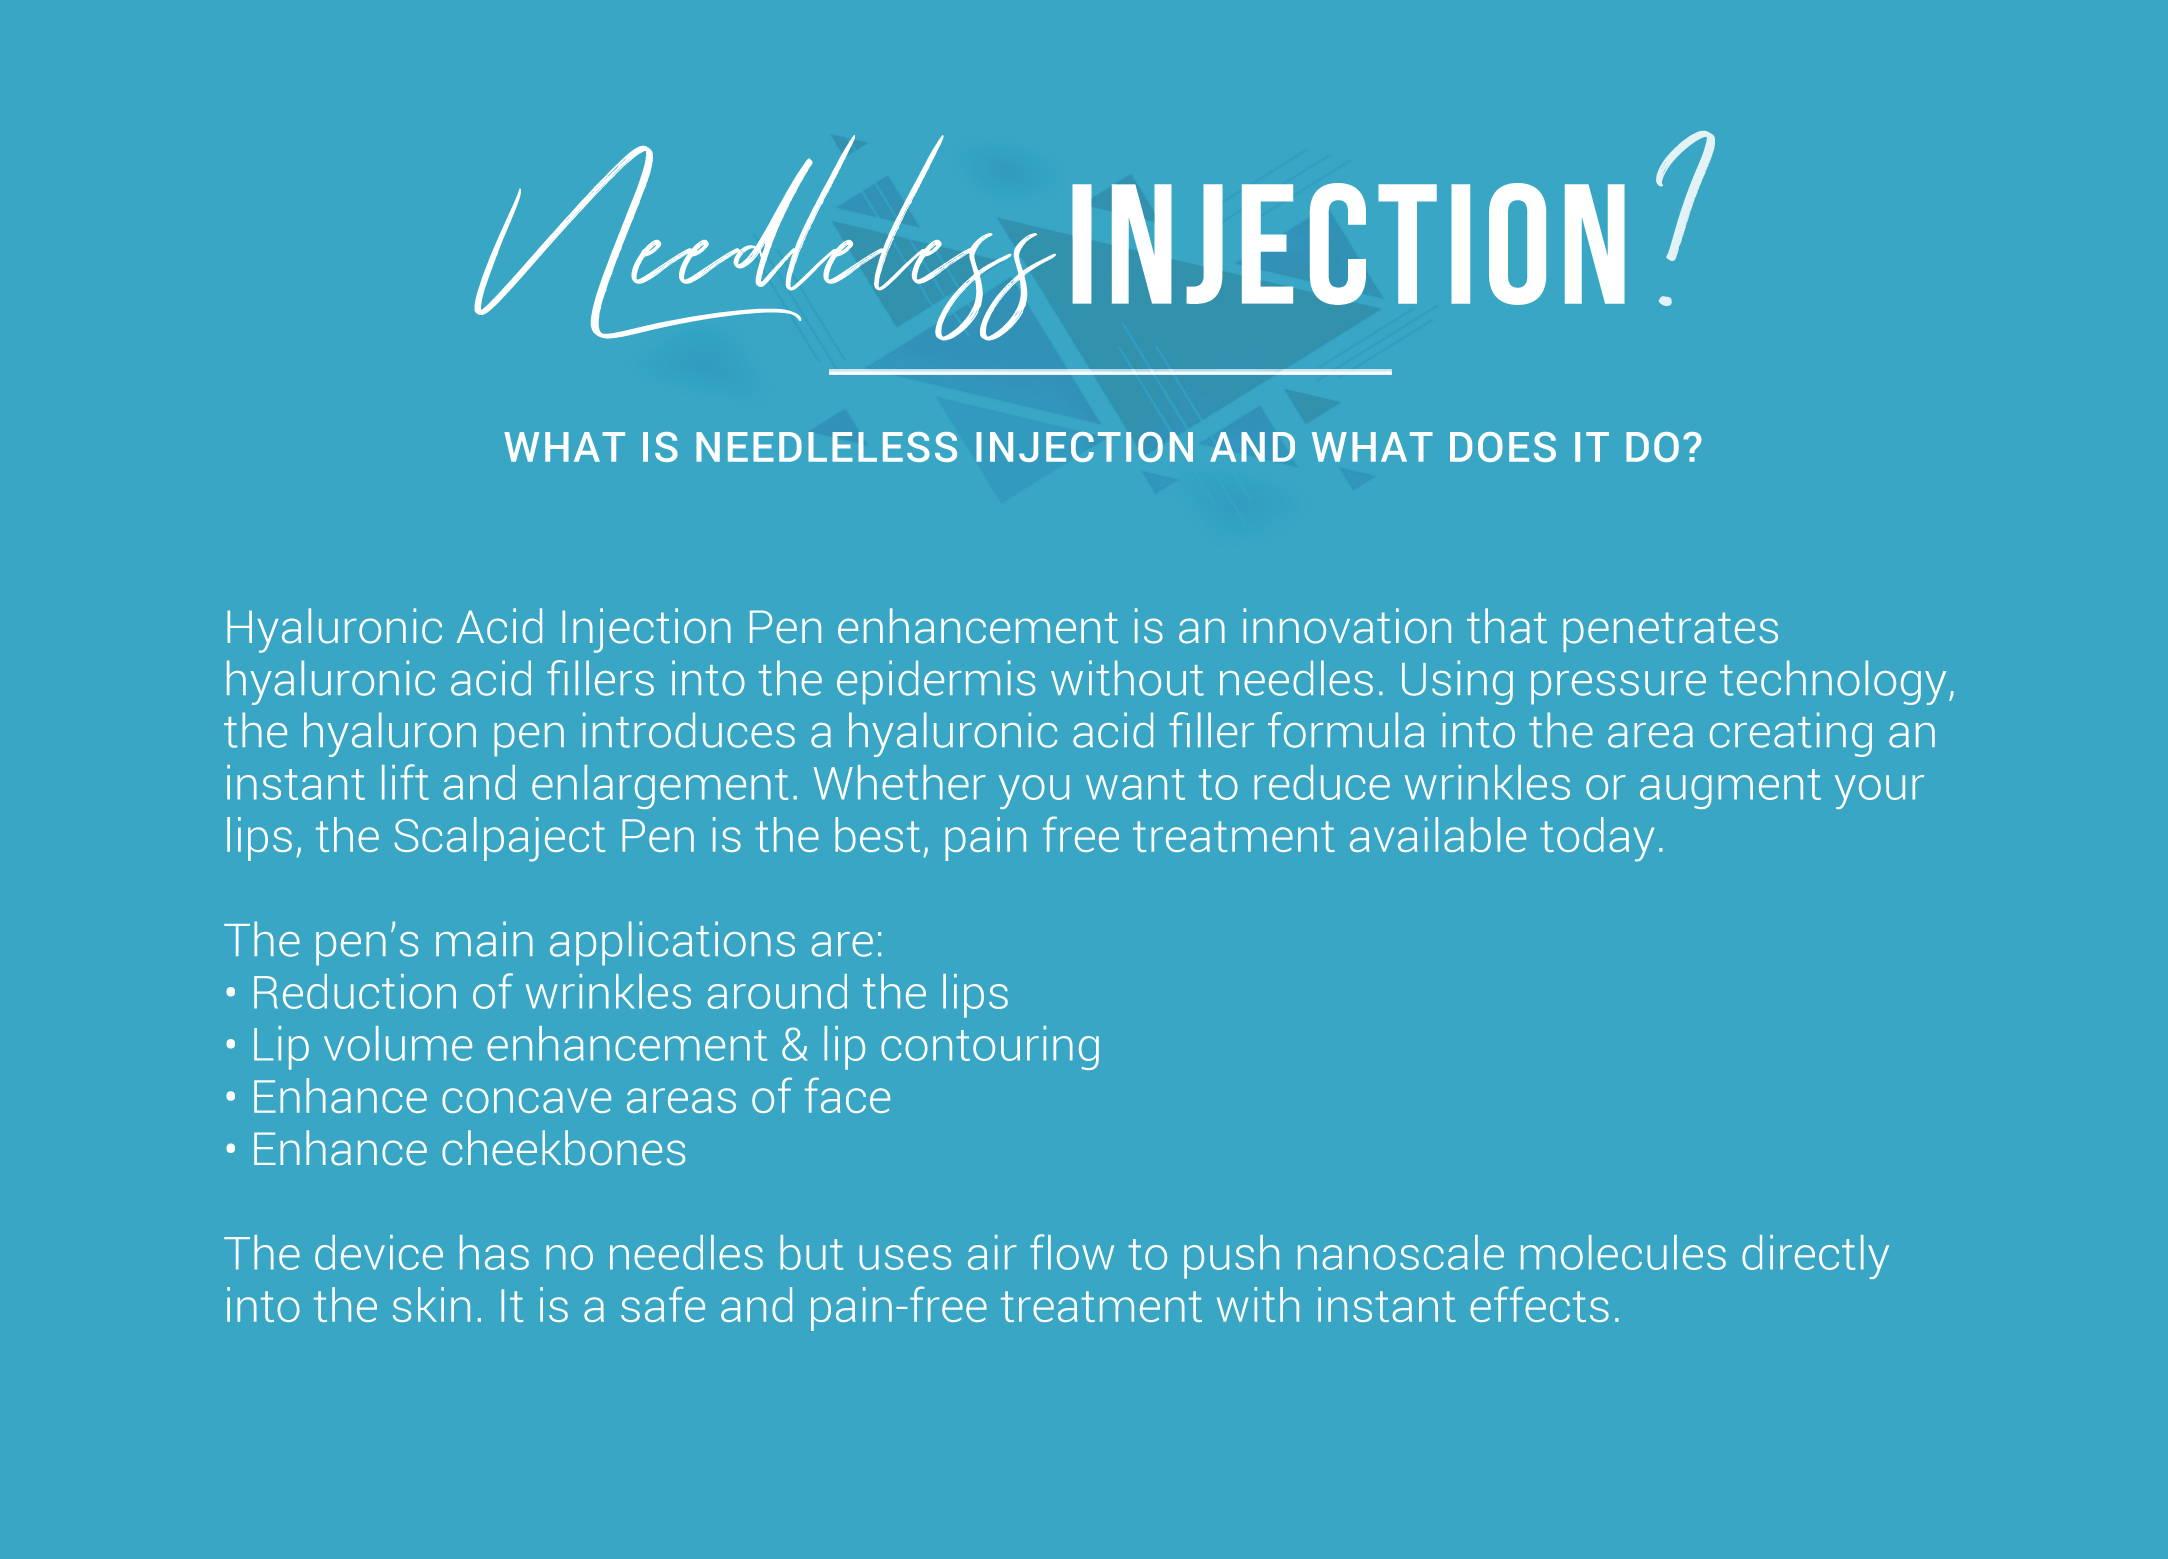 Hyaluron Pen Needleless Injection Training Scalpaject